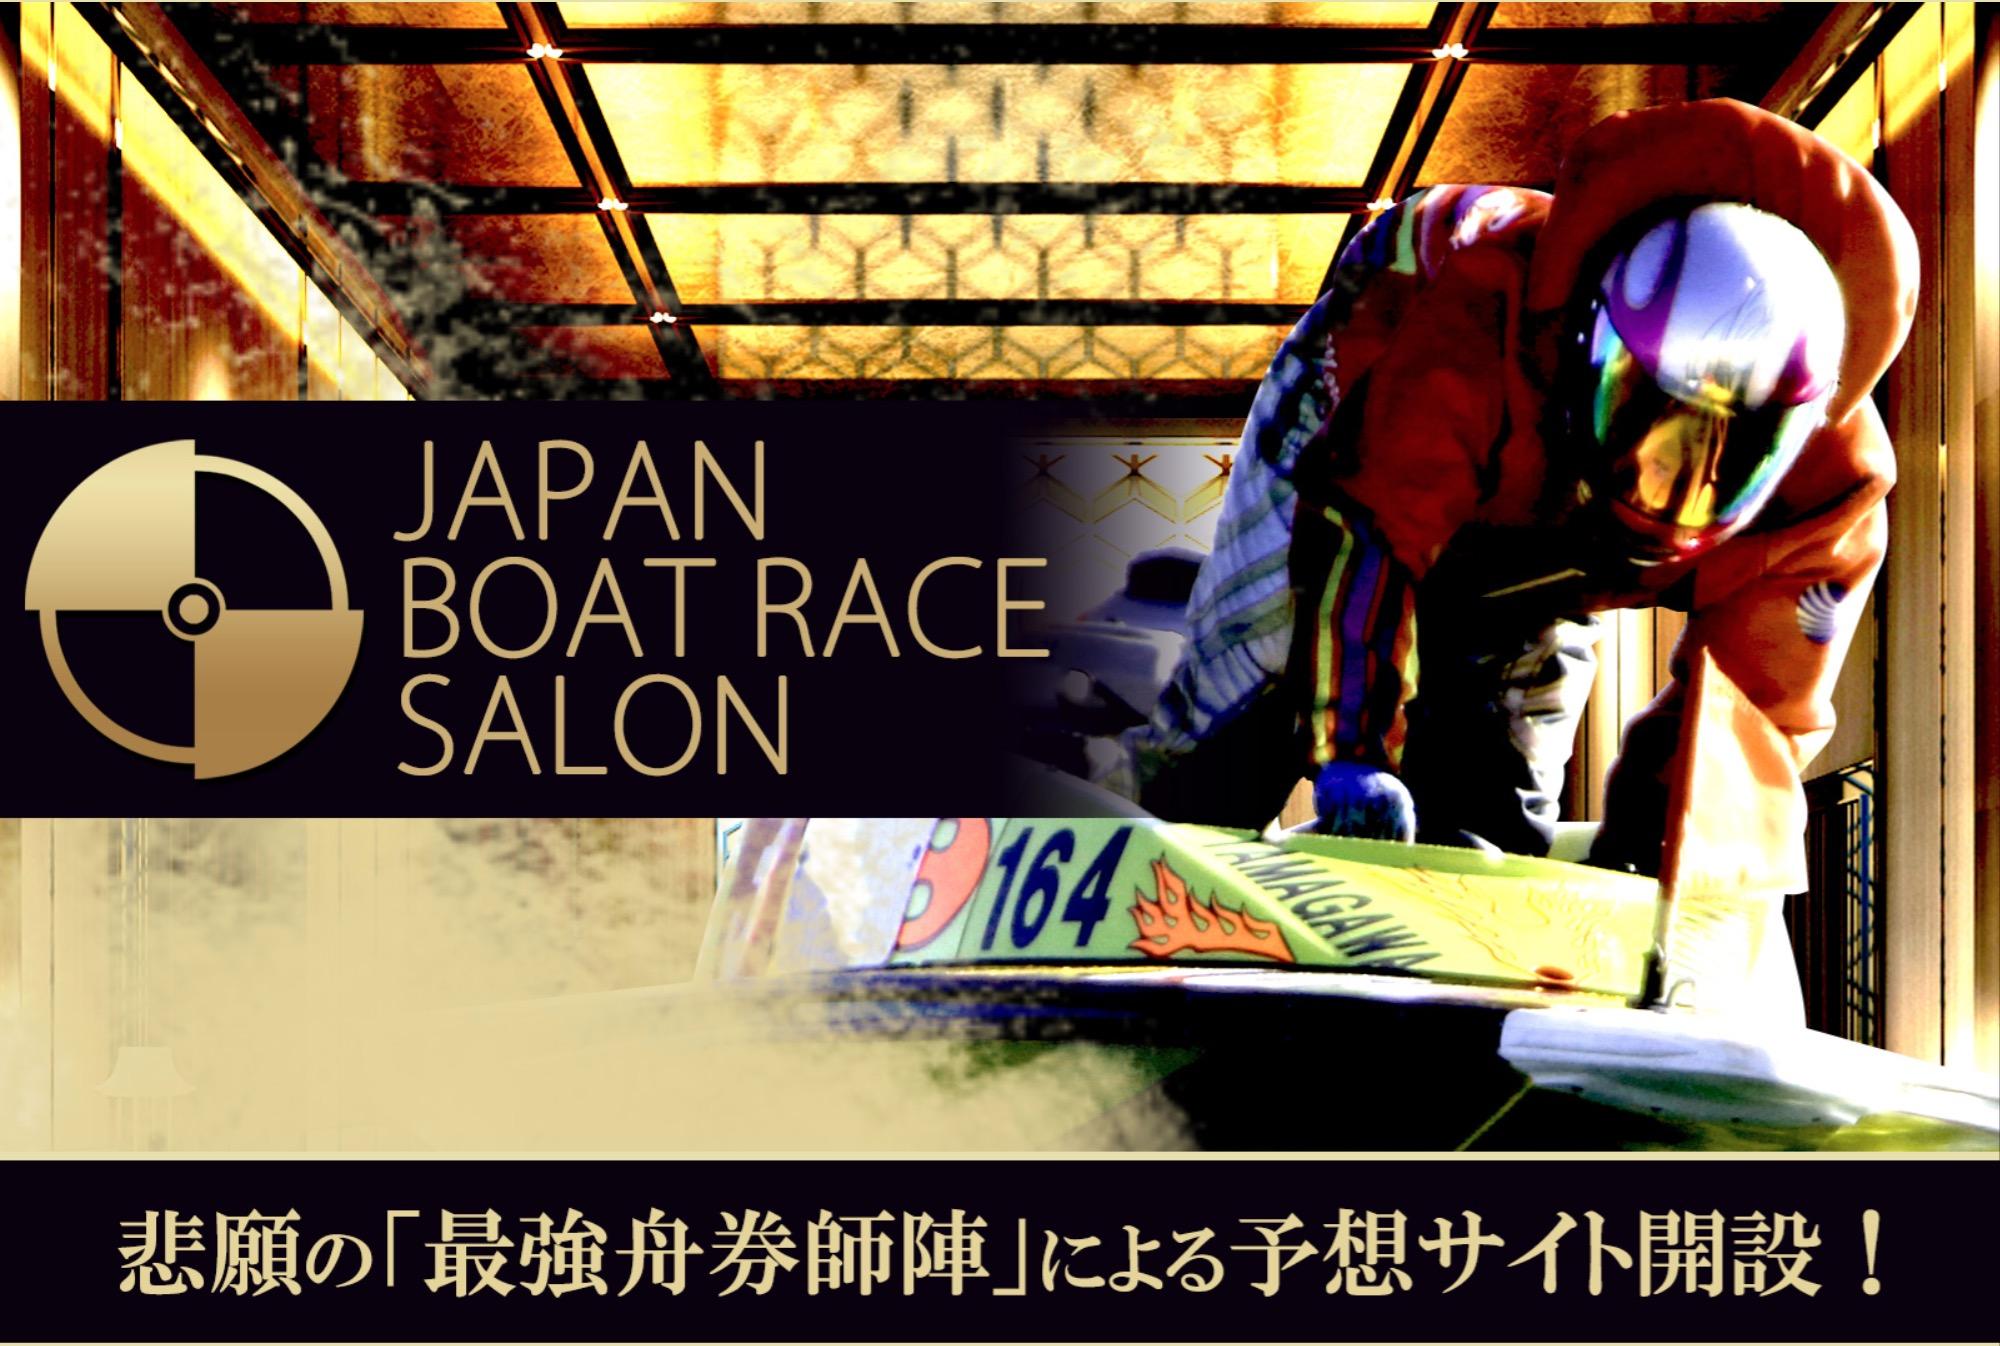 JAPAN BOATRACE SALON(ジャパンボートレースサロン)1